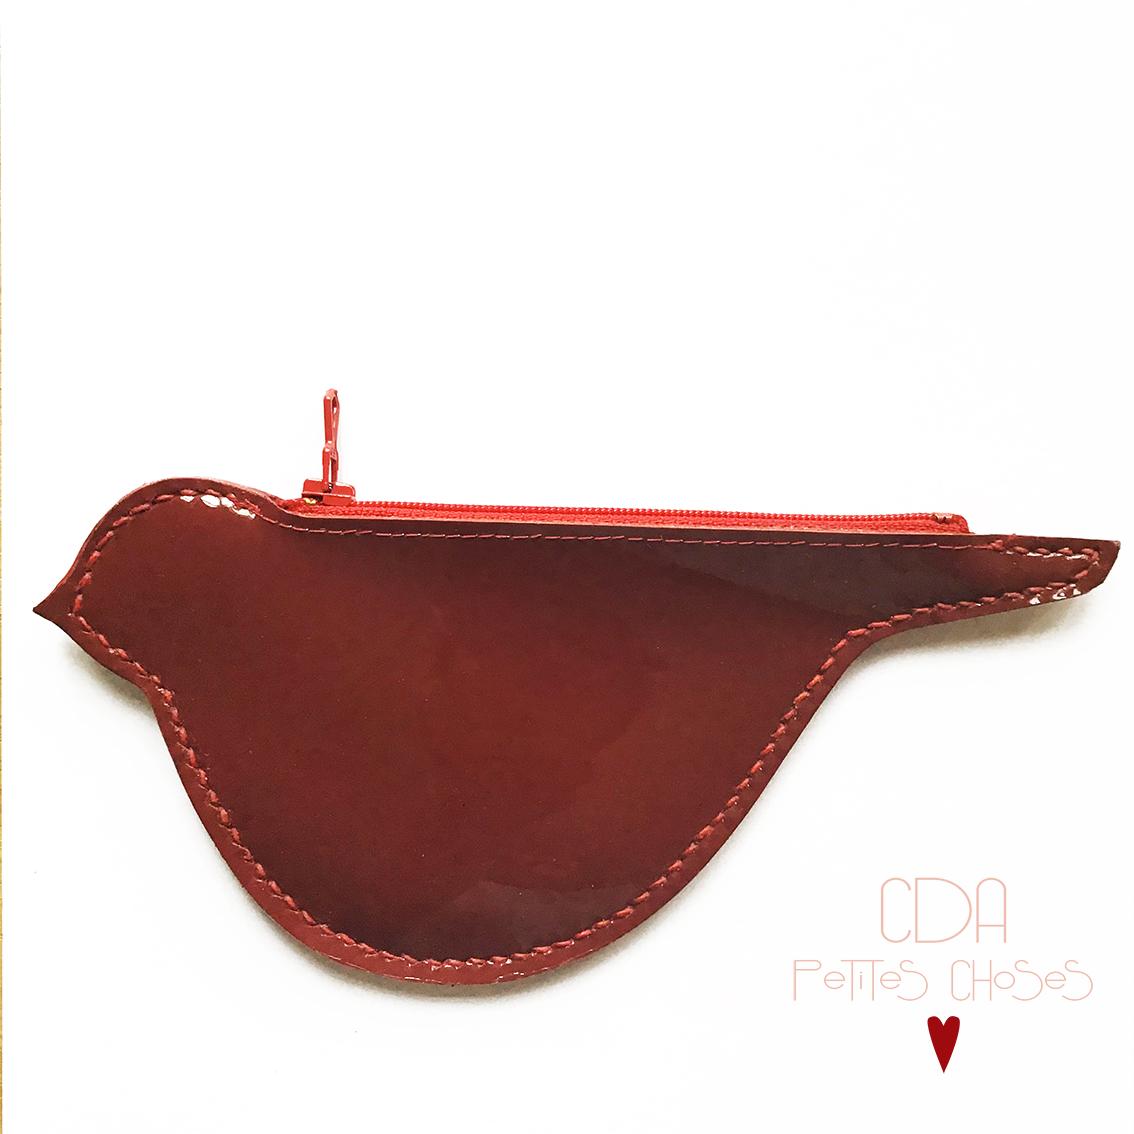 porte-monnaie-oiseau-vernis lisse rouge CDA Petites Choses